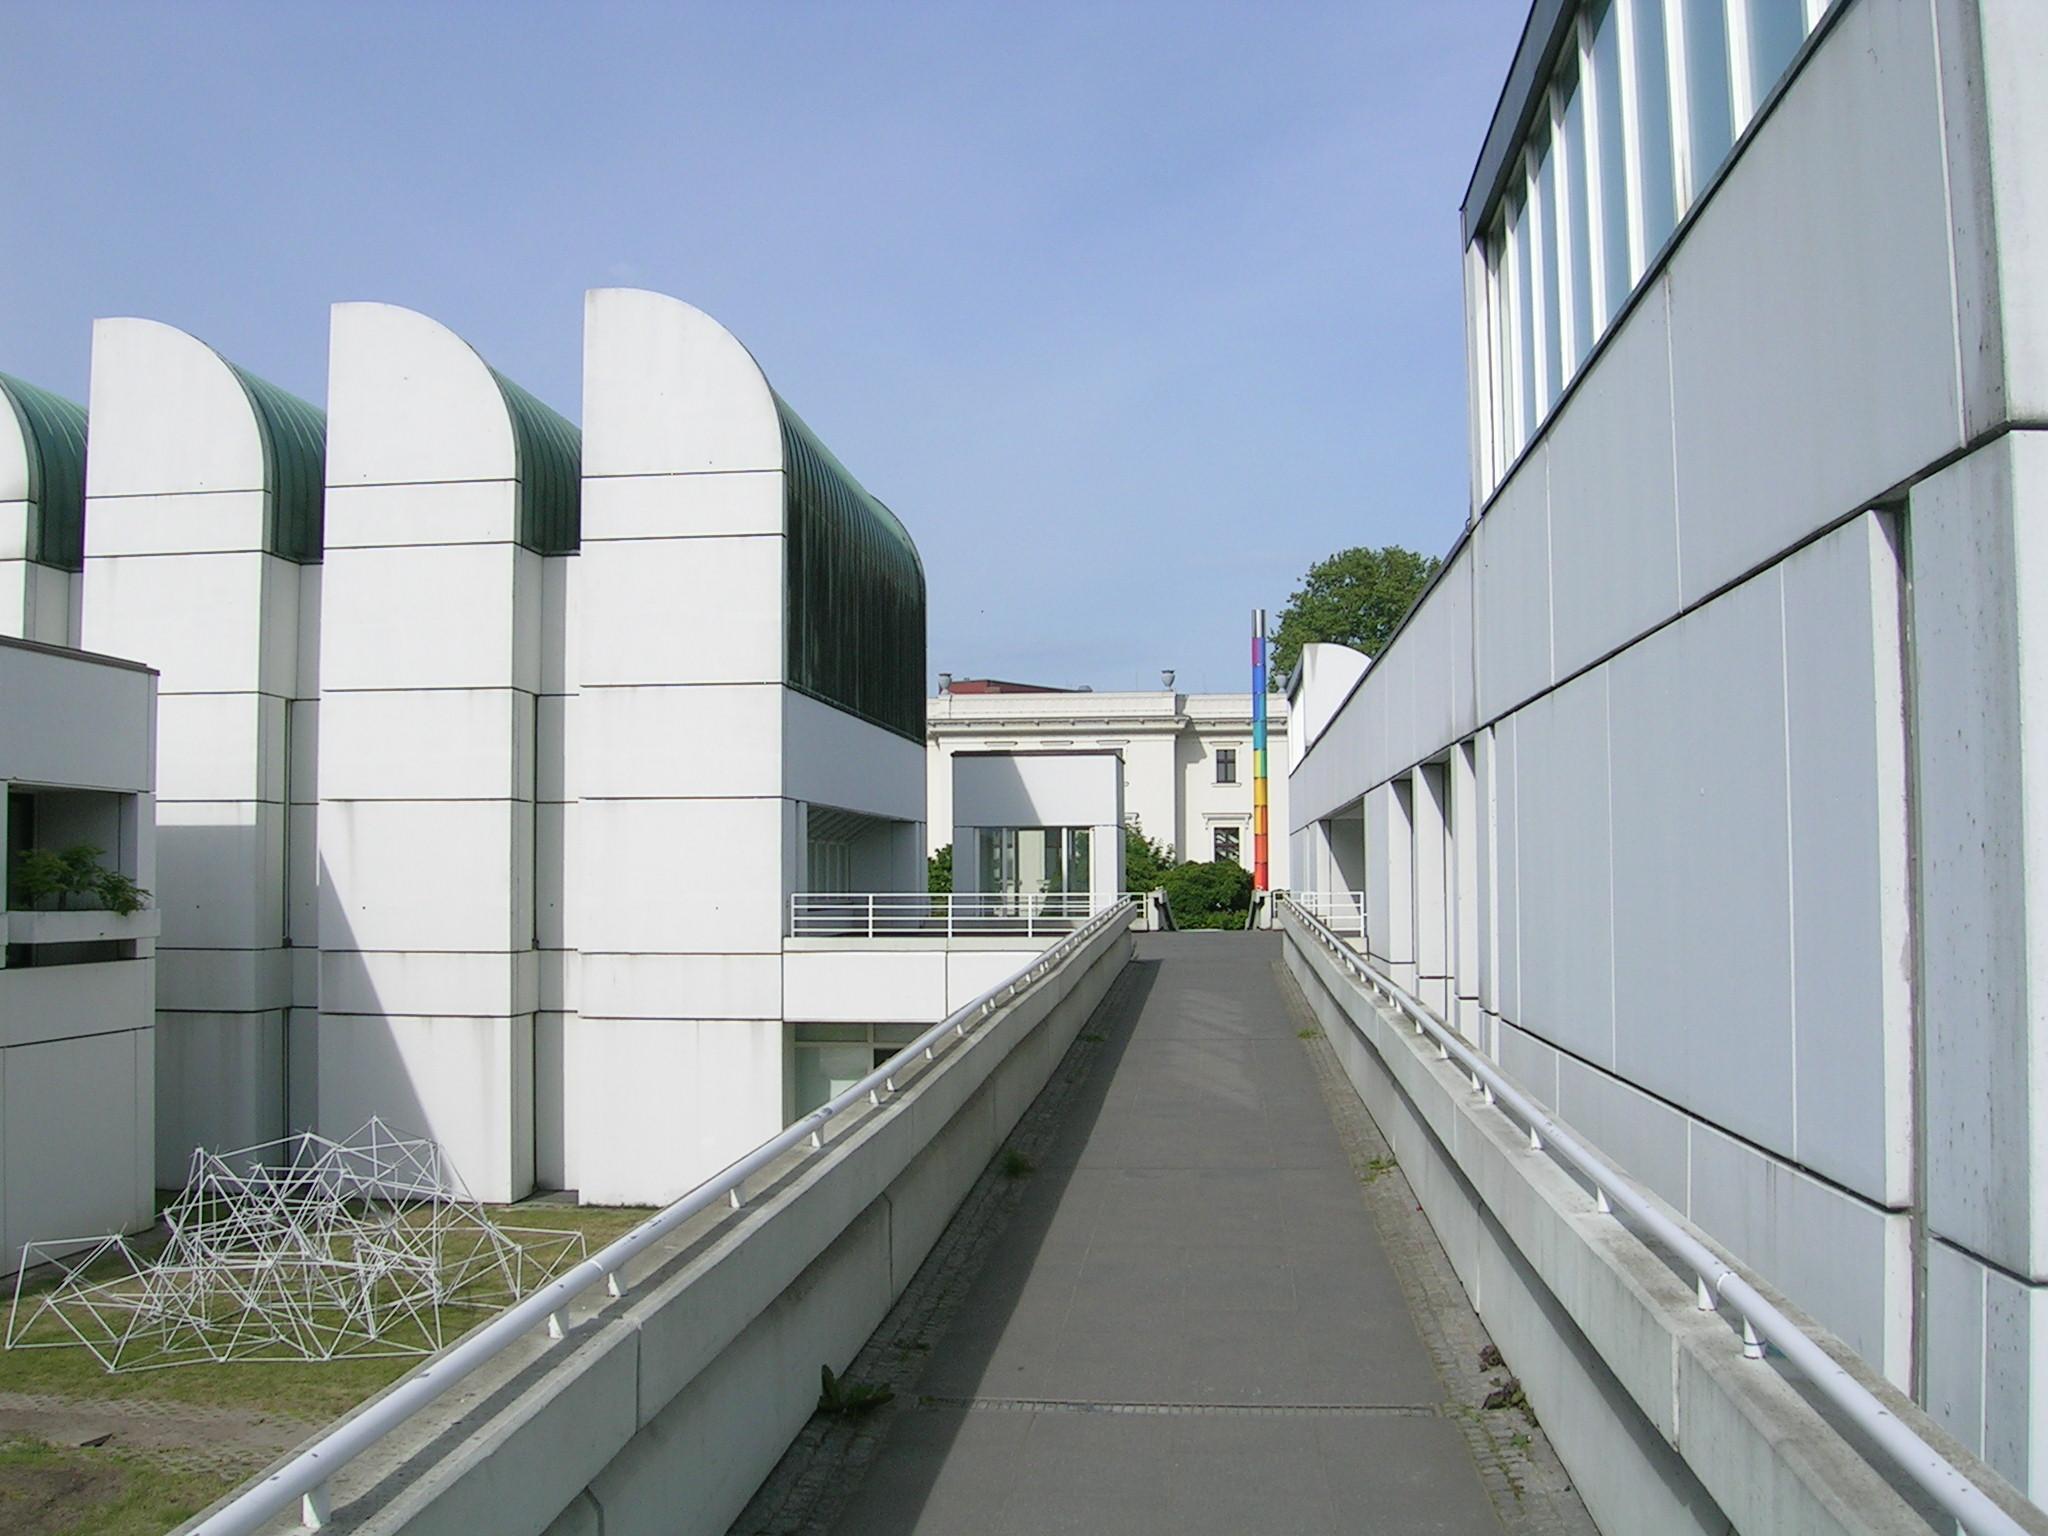 Archivio Bauhaus A Berlino Attanasio Architettura